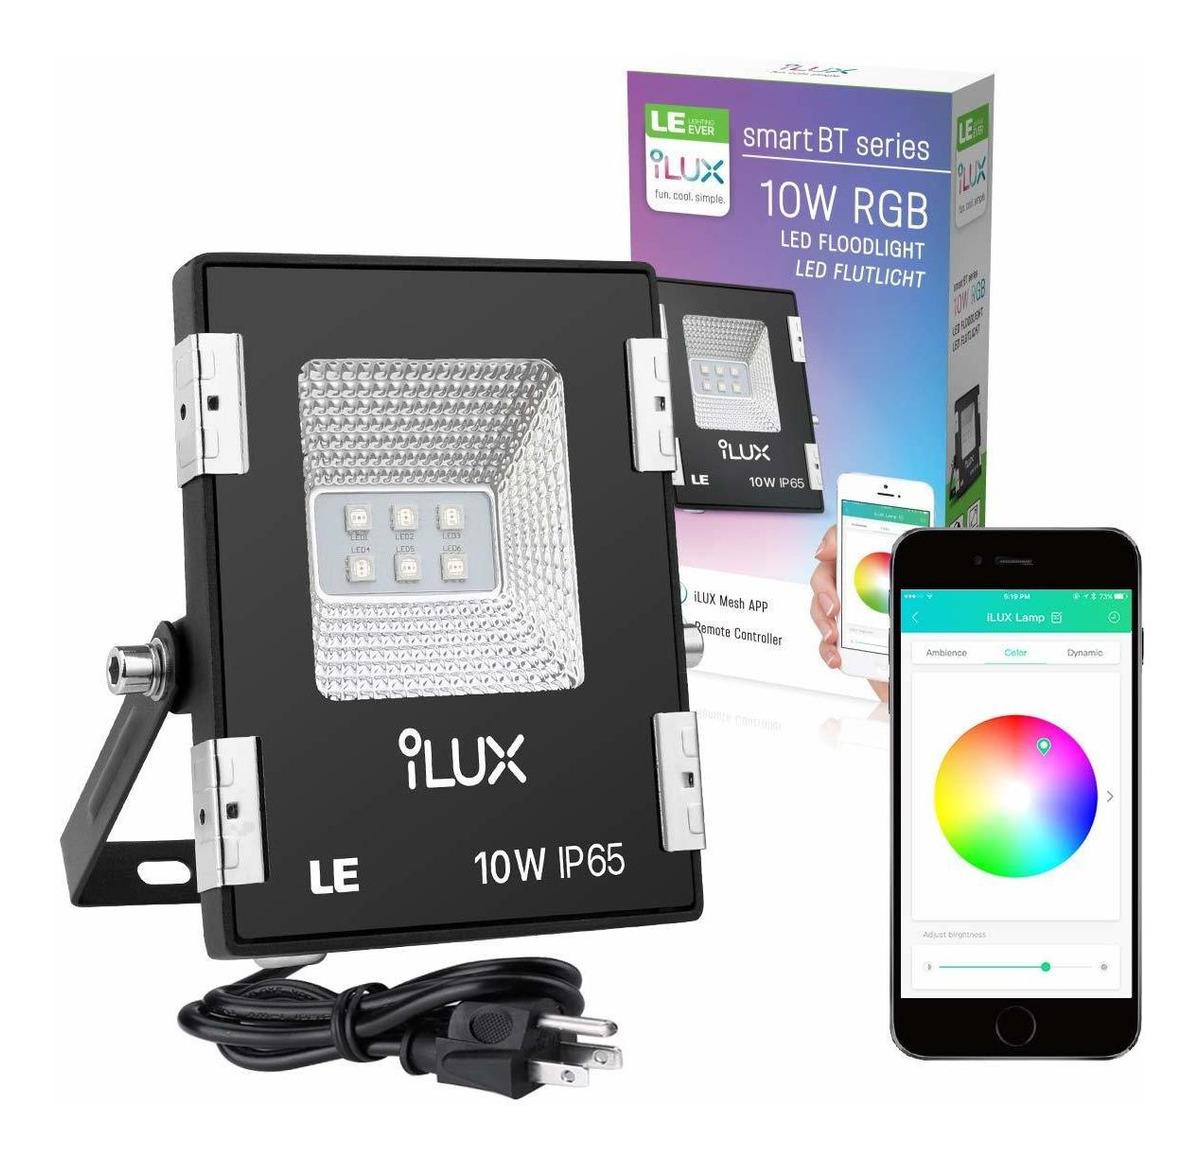 Image of: Le Ilux Smart Led Flood Light Outdoor Plug In 10w Rgb Dim 163 900 En Mercado Libre